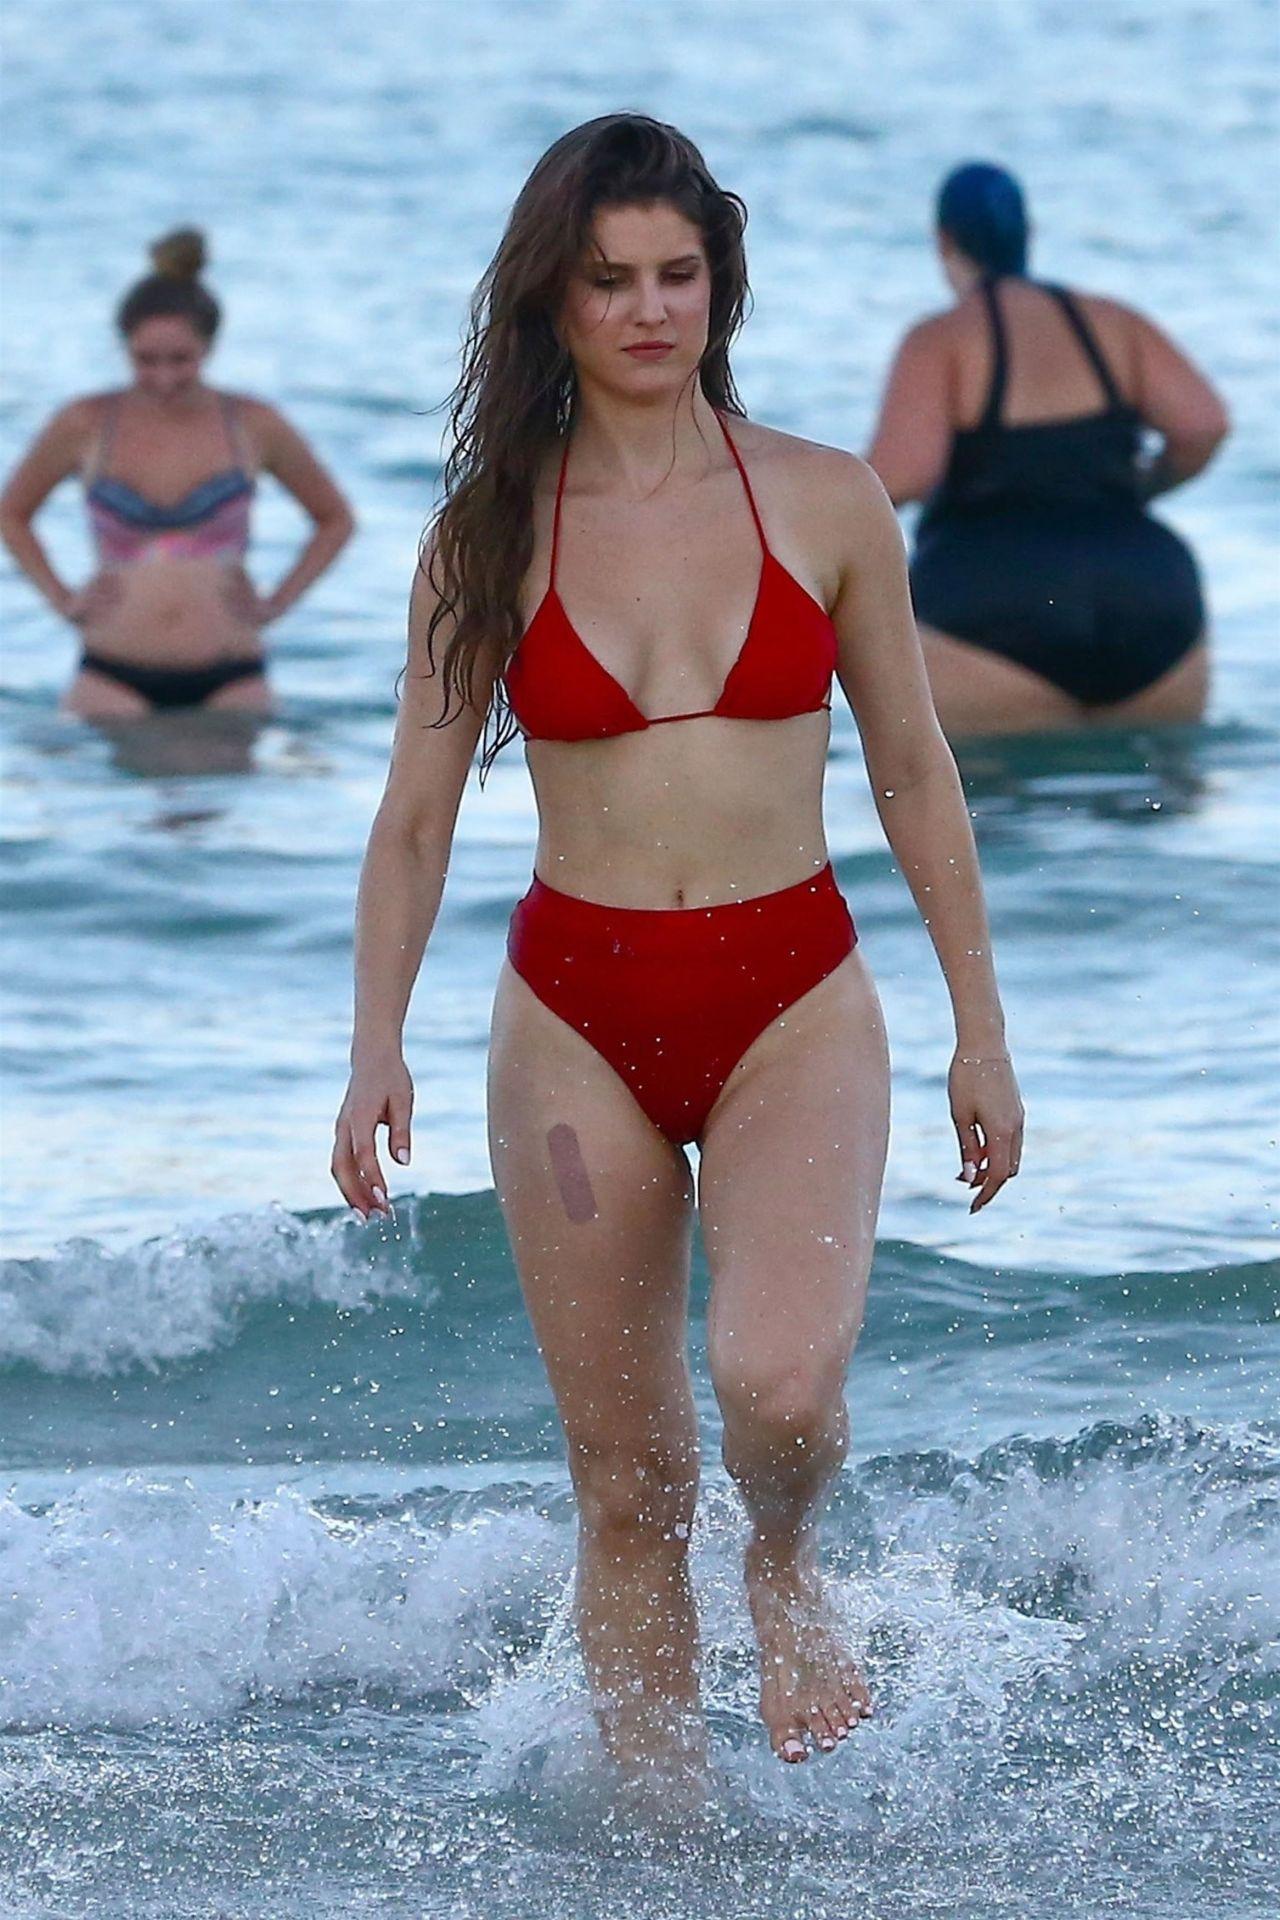 Amanda Cerny Showing Off Her Bikini Body in Miami 07/27